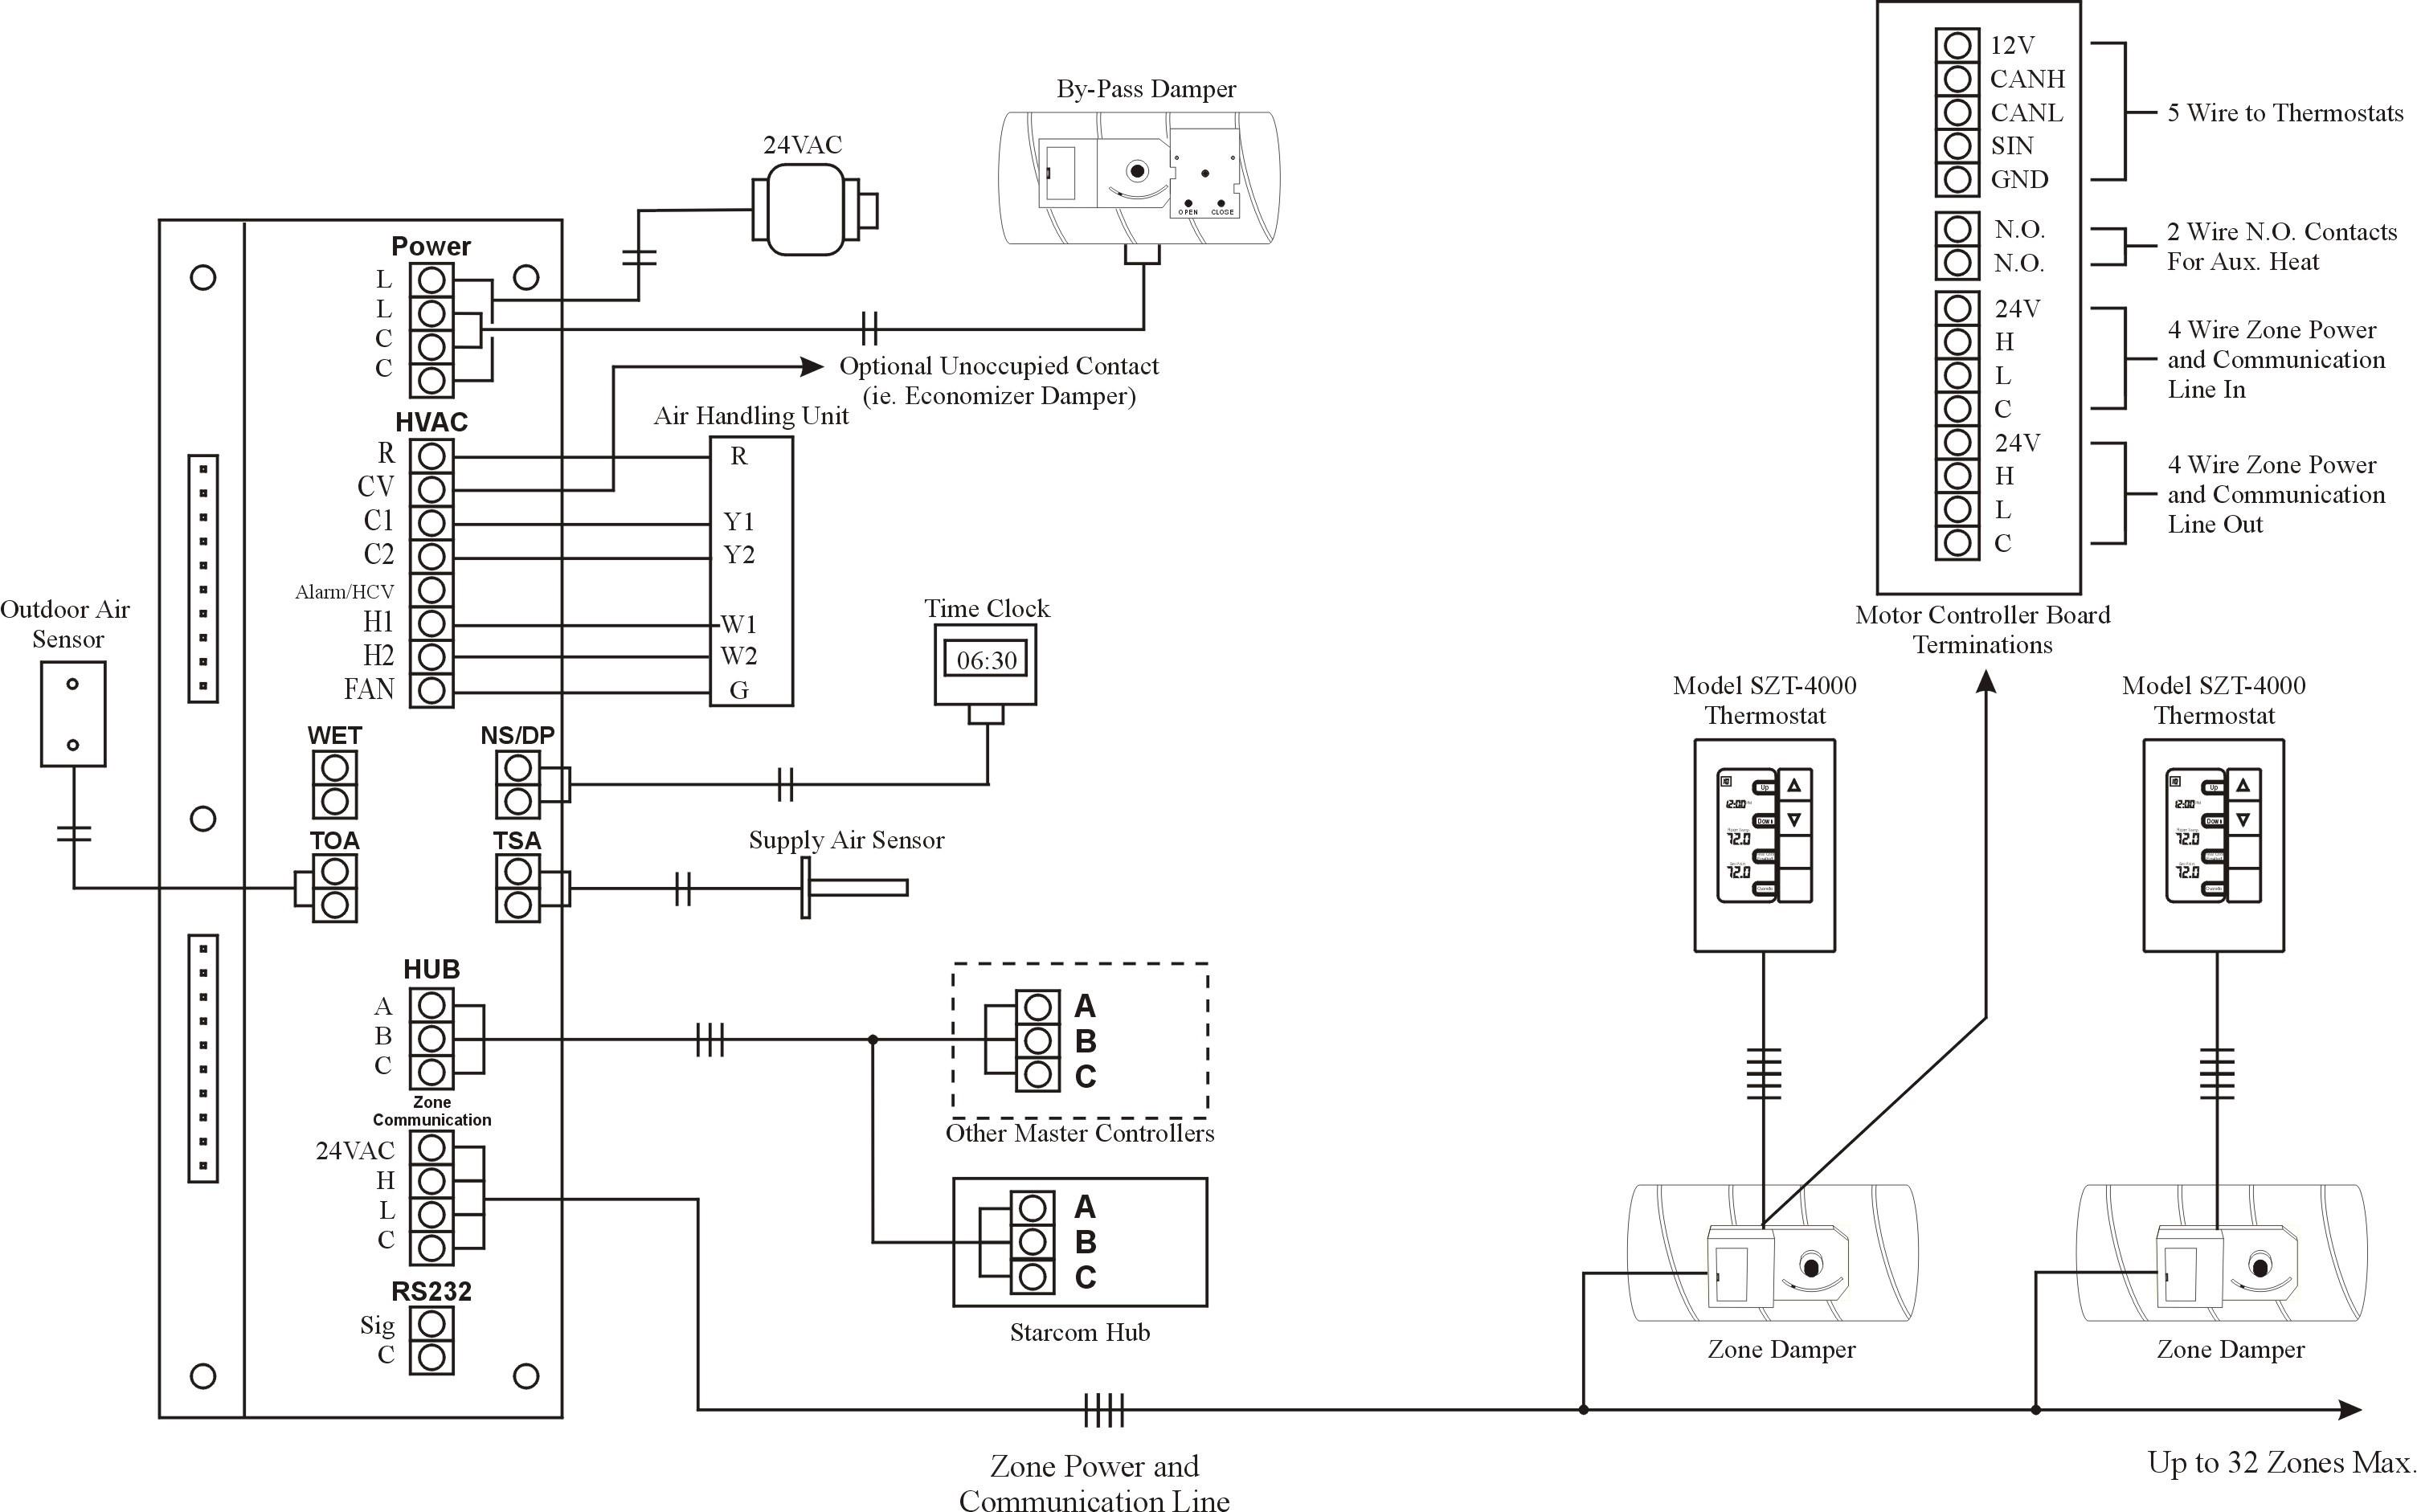 fire alarm wiring diagram pdf wiring diagramwiring diagram for fire alarm system auto electrical wiring diagramwiring diagram for fire alarm system